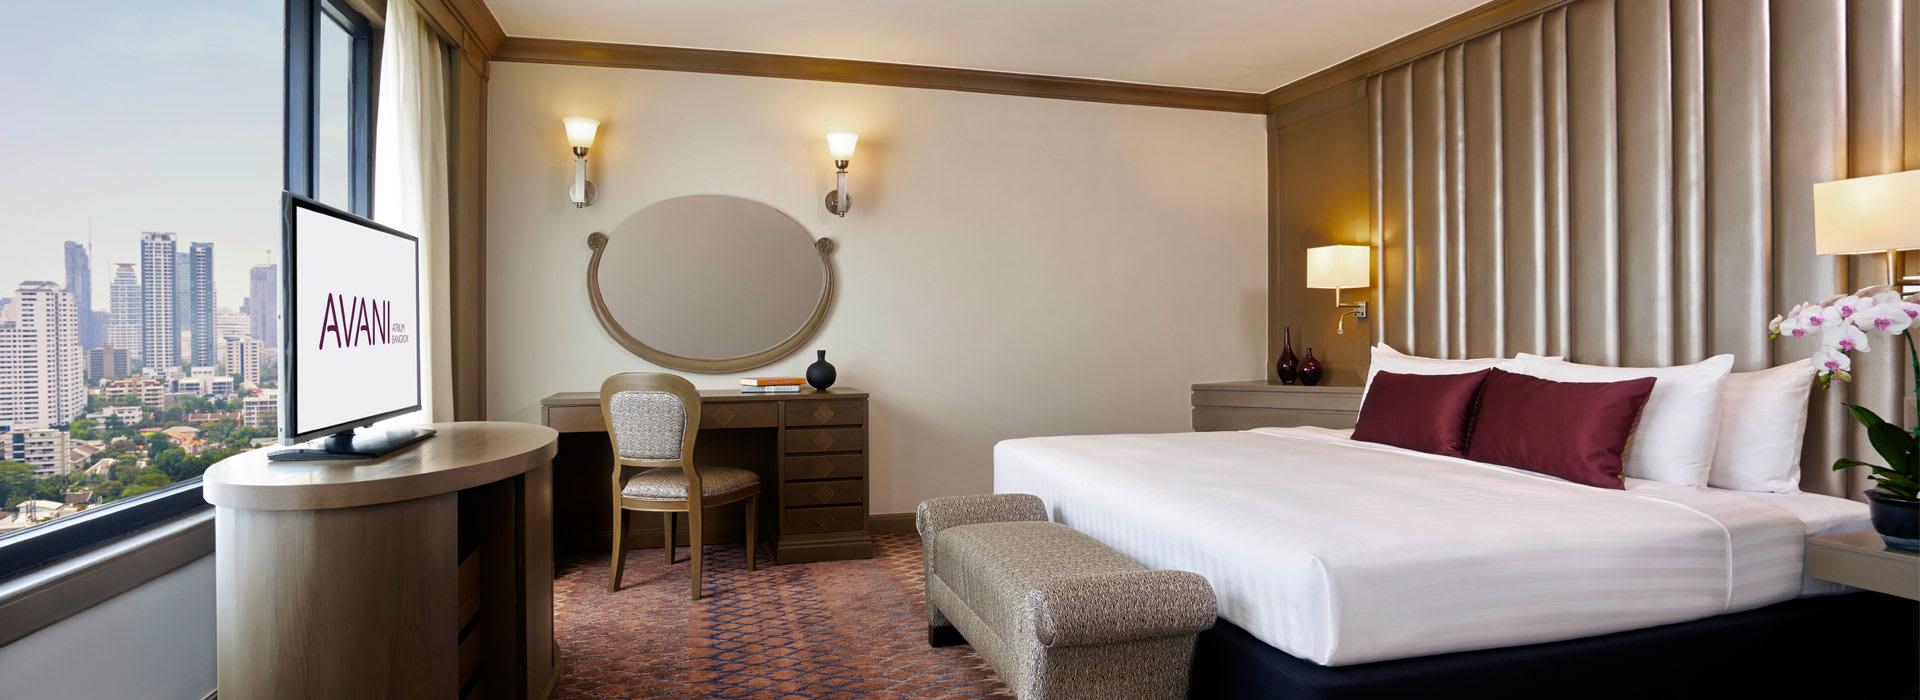 Executive Suite of Bangkok city hotels by AVANI